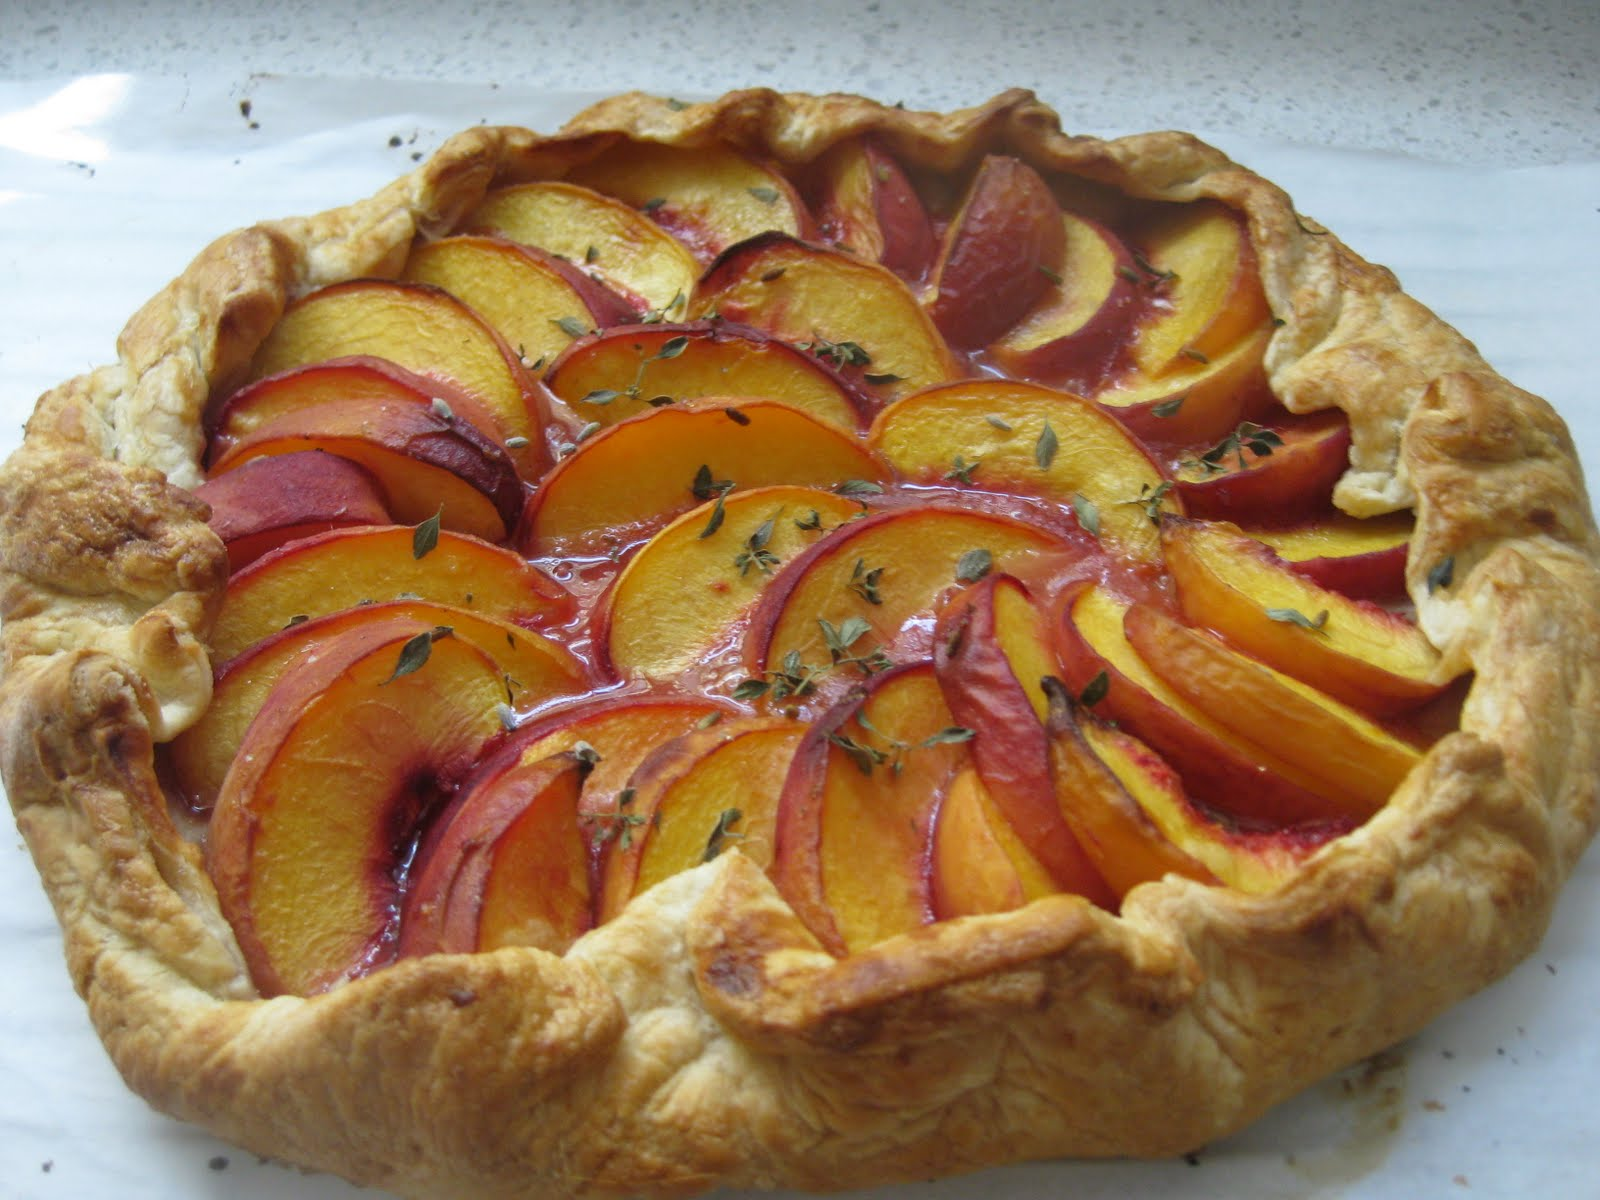 Dinner Tonight: Peach Galette with Lemon Thyme & Lavender Honey